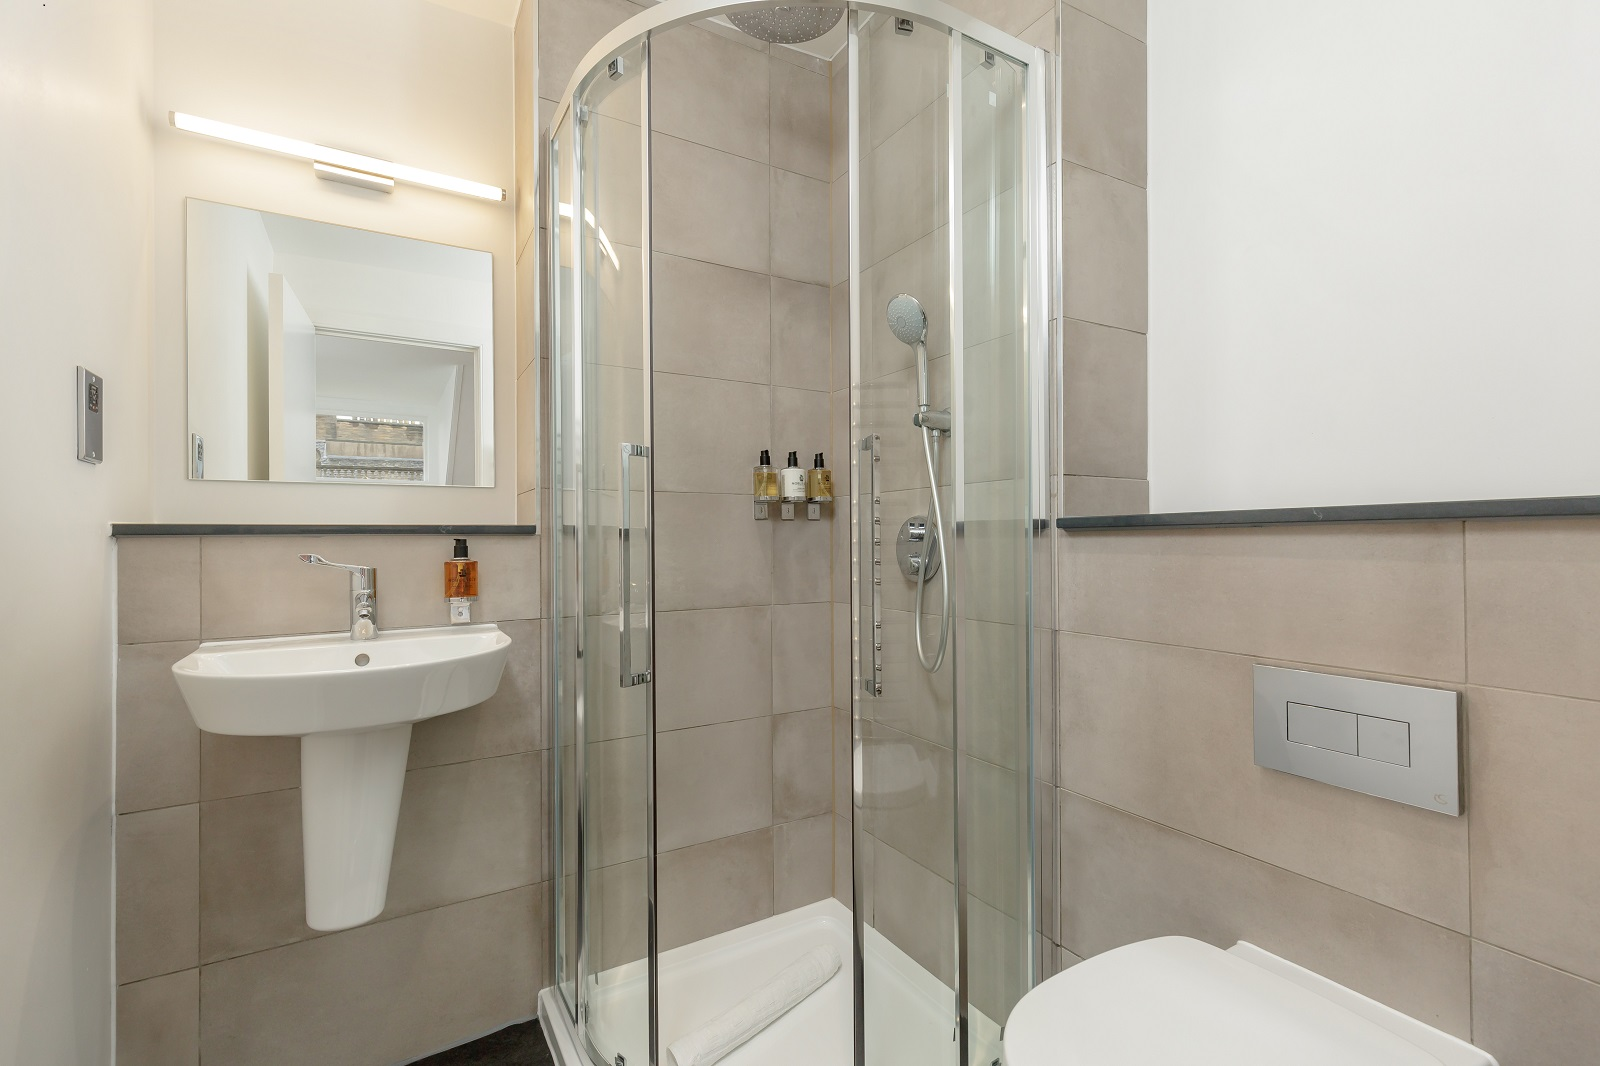 Shower at Hanover Serviced Apartments